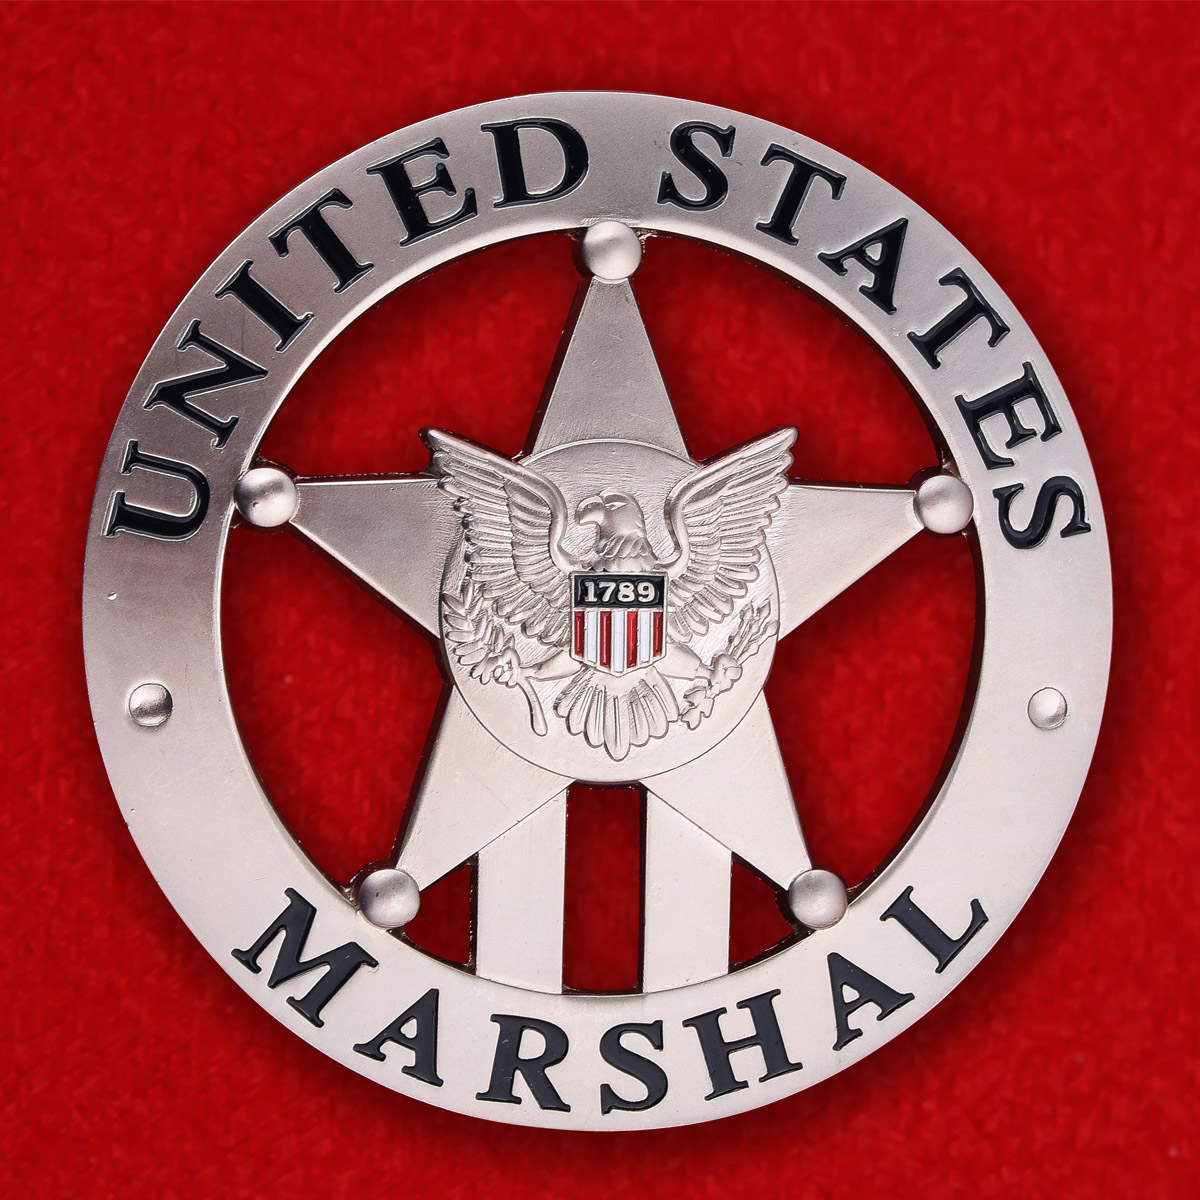 Нагрудный знак маршала США